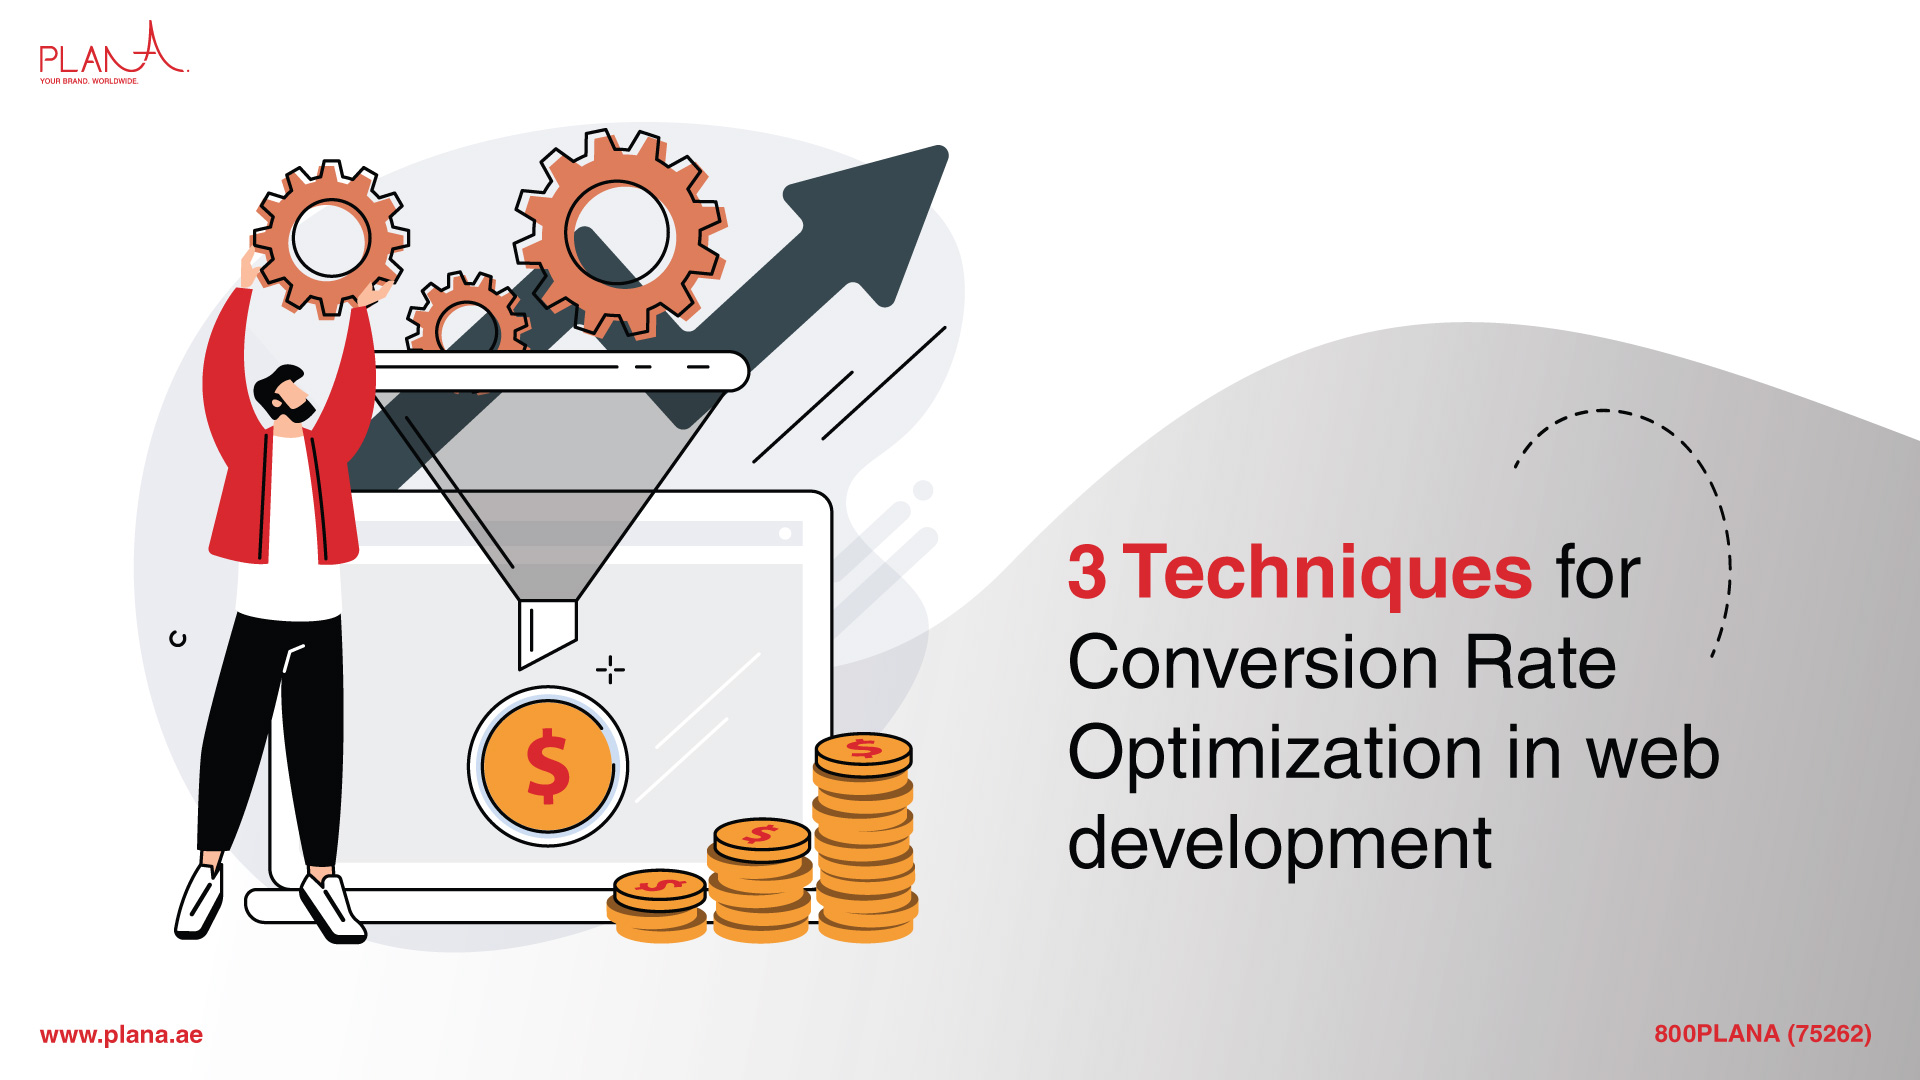 3 Techniques for Conversion Rate Optimization in Web Development